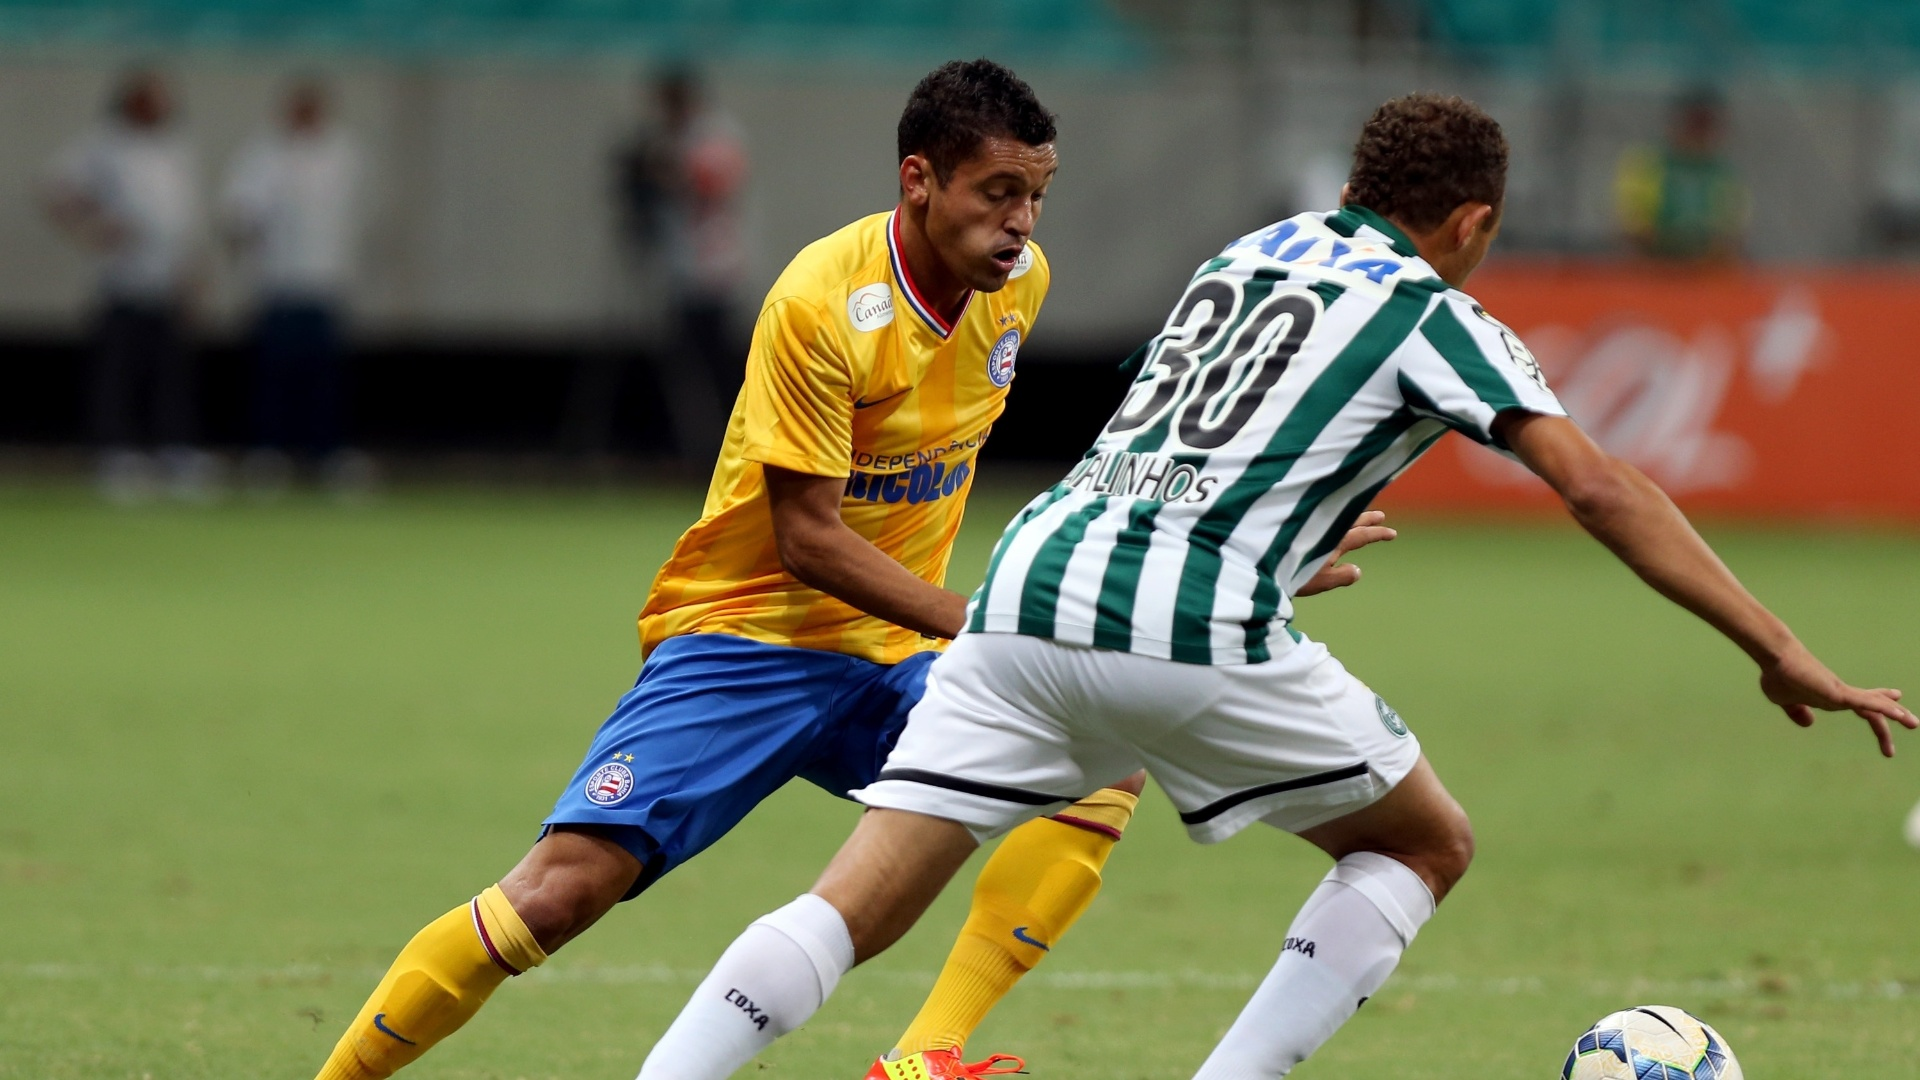 Carlinhos tenta driblar Diego Macedo na partida entre Bahia e Coritiba